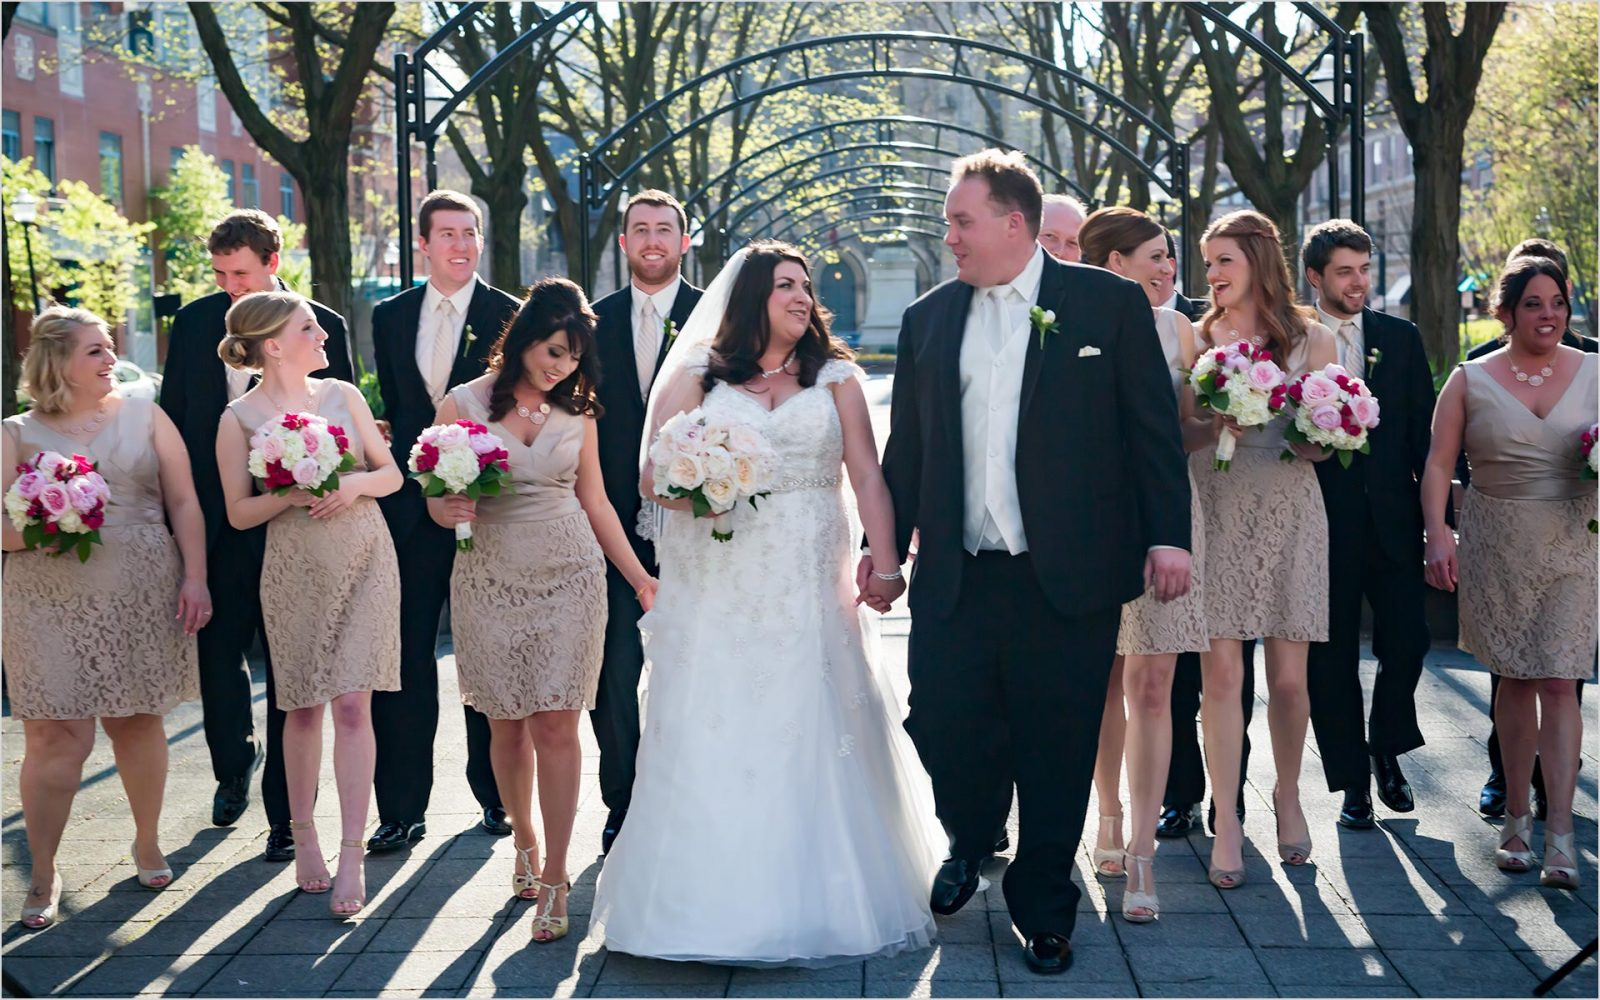 The Phoenix Cincinnati wedding, Garfield Park